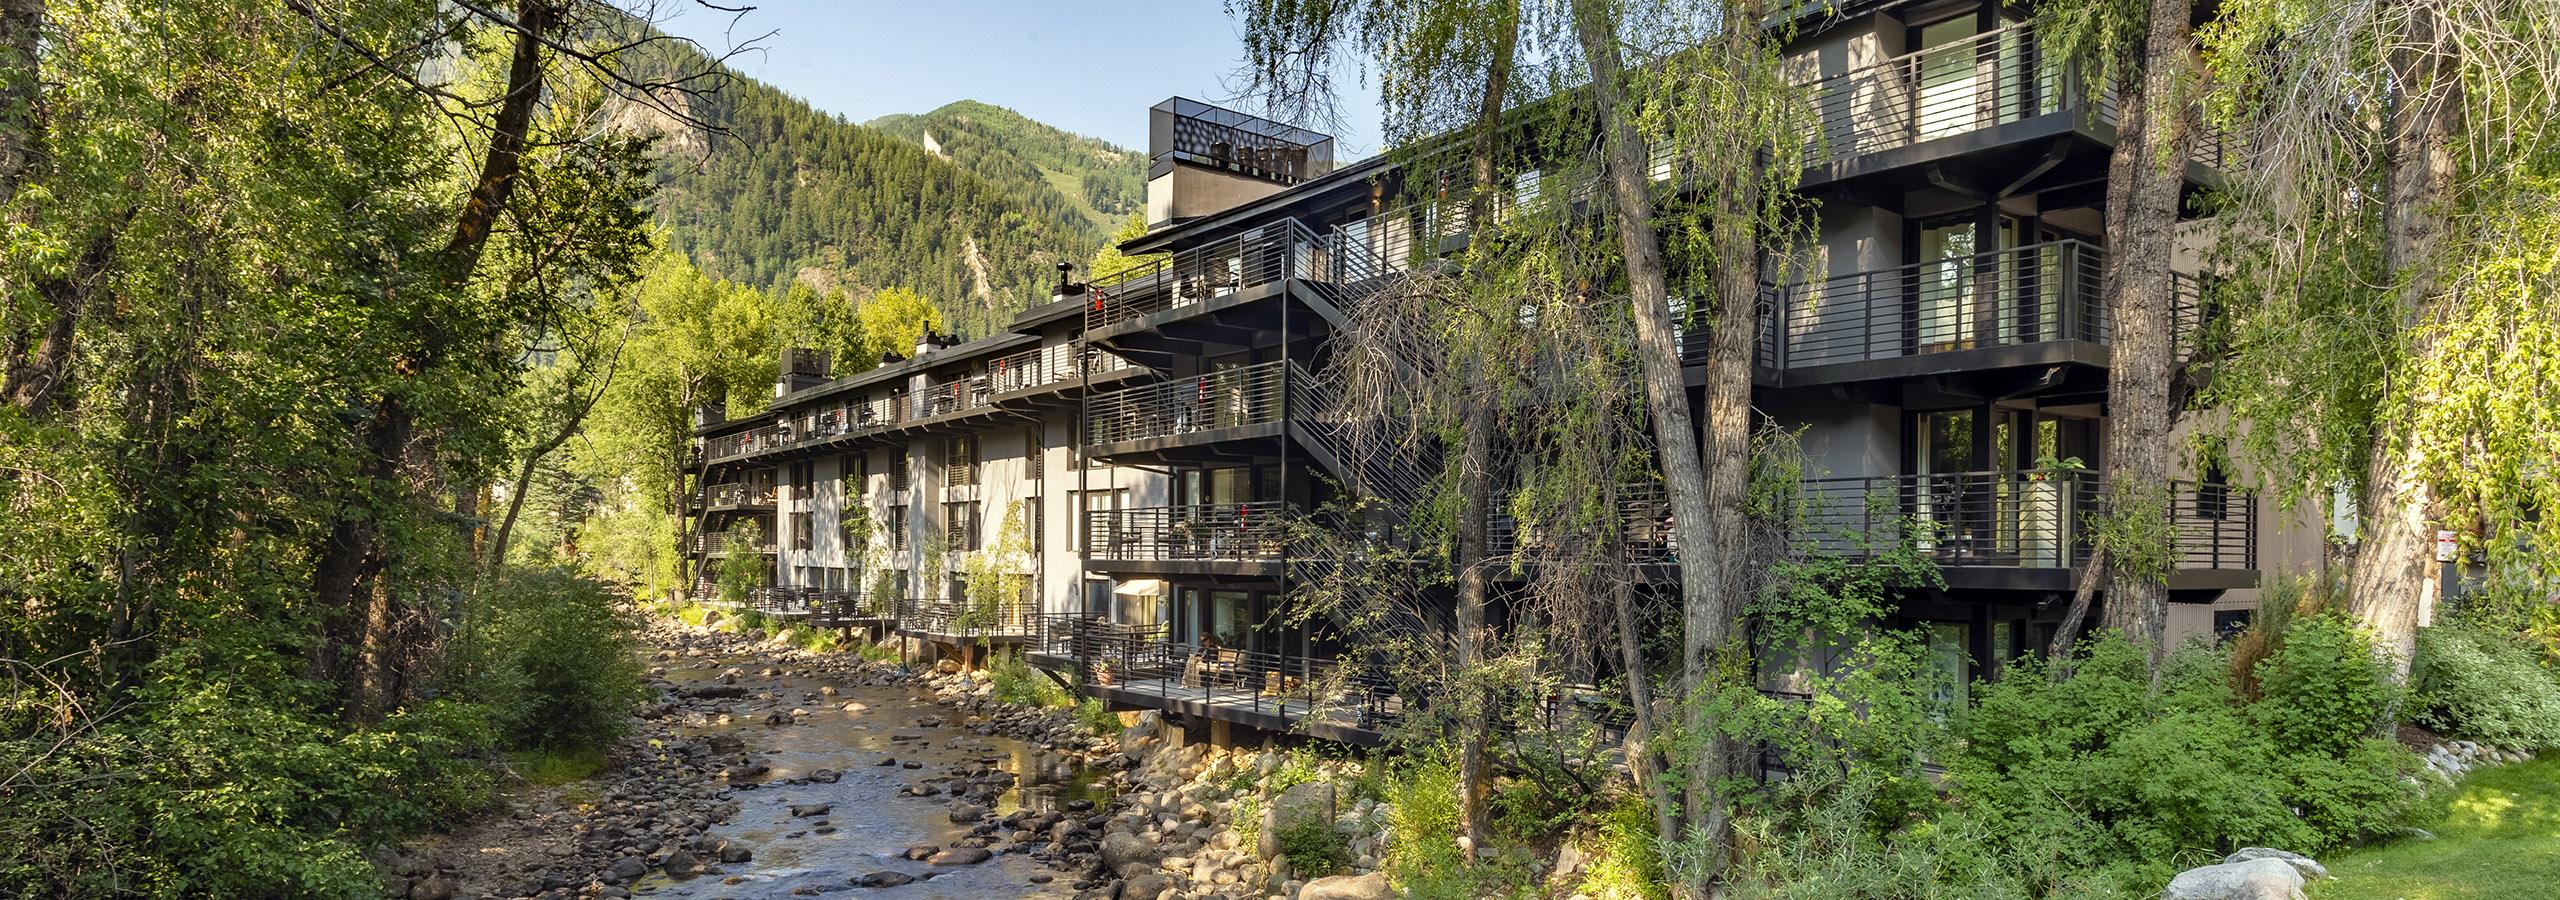 Chateau Roaring Fork Condo Rentals in Aspen